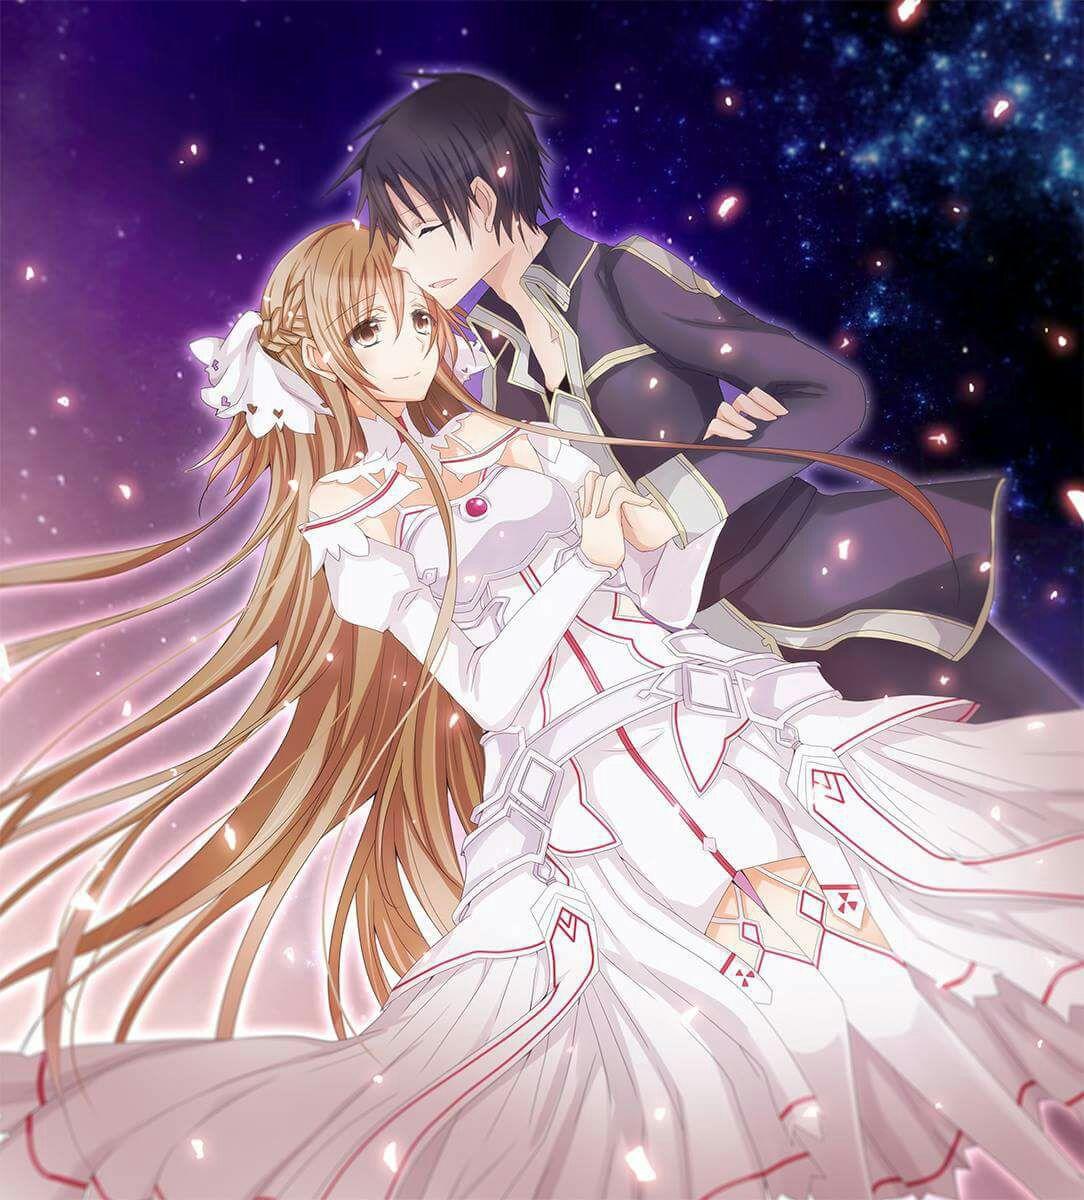 Sword Art Online Kirito And Asuna Wedding Fanfiction Wiring Diagrams F350 Diagram Http Wwwjustanswercom Ford 50adb2008f350 Drawings Picture 15 Wattpad Rh Com Daughter Married